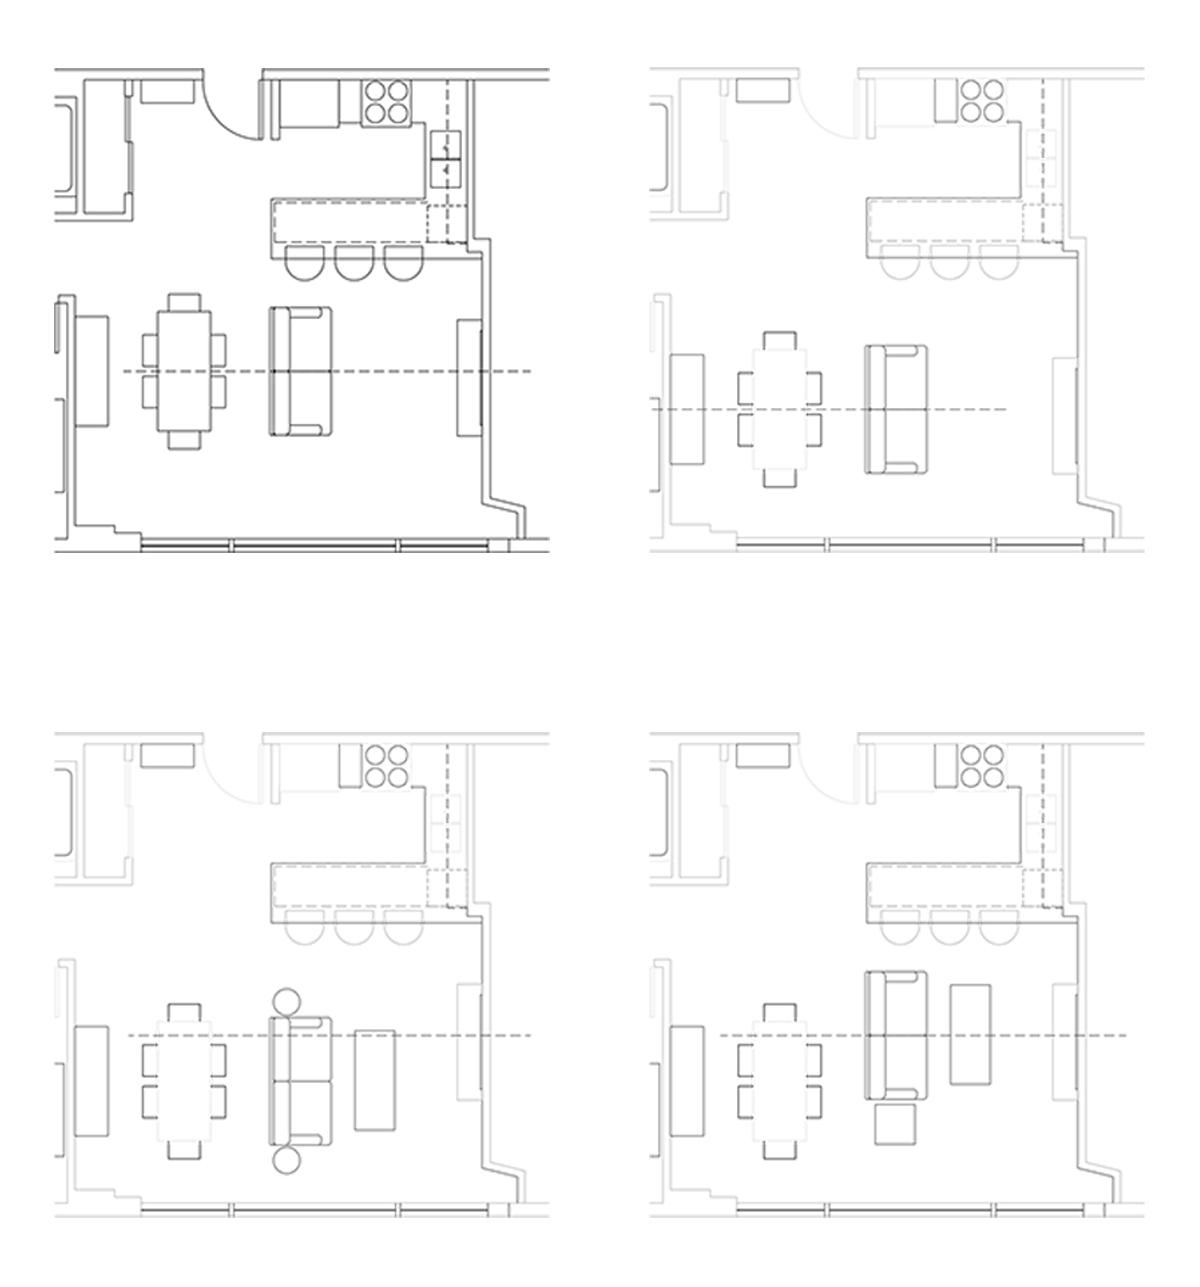 hubbard layouts.jpg